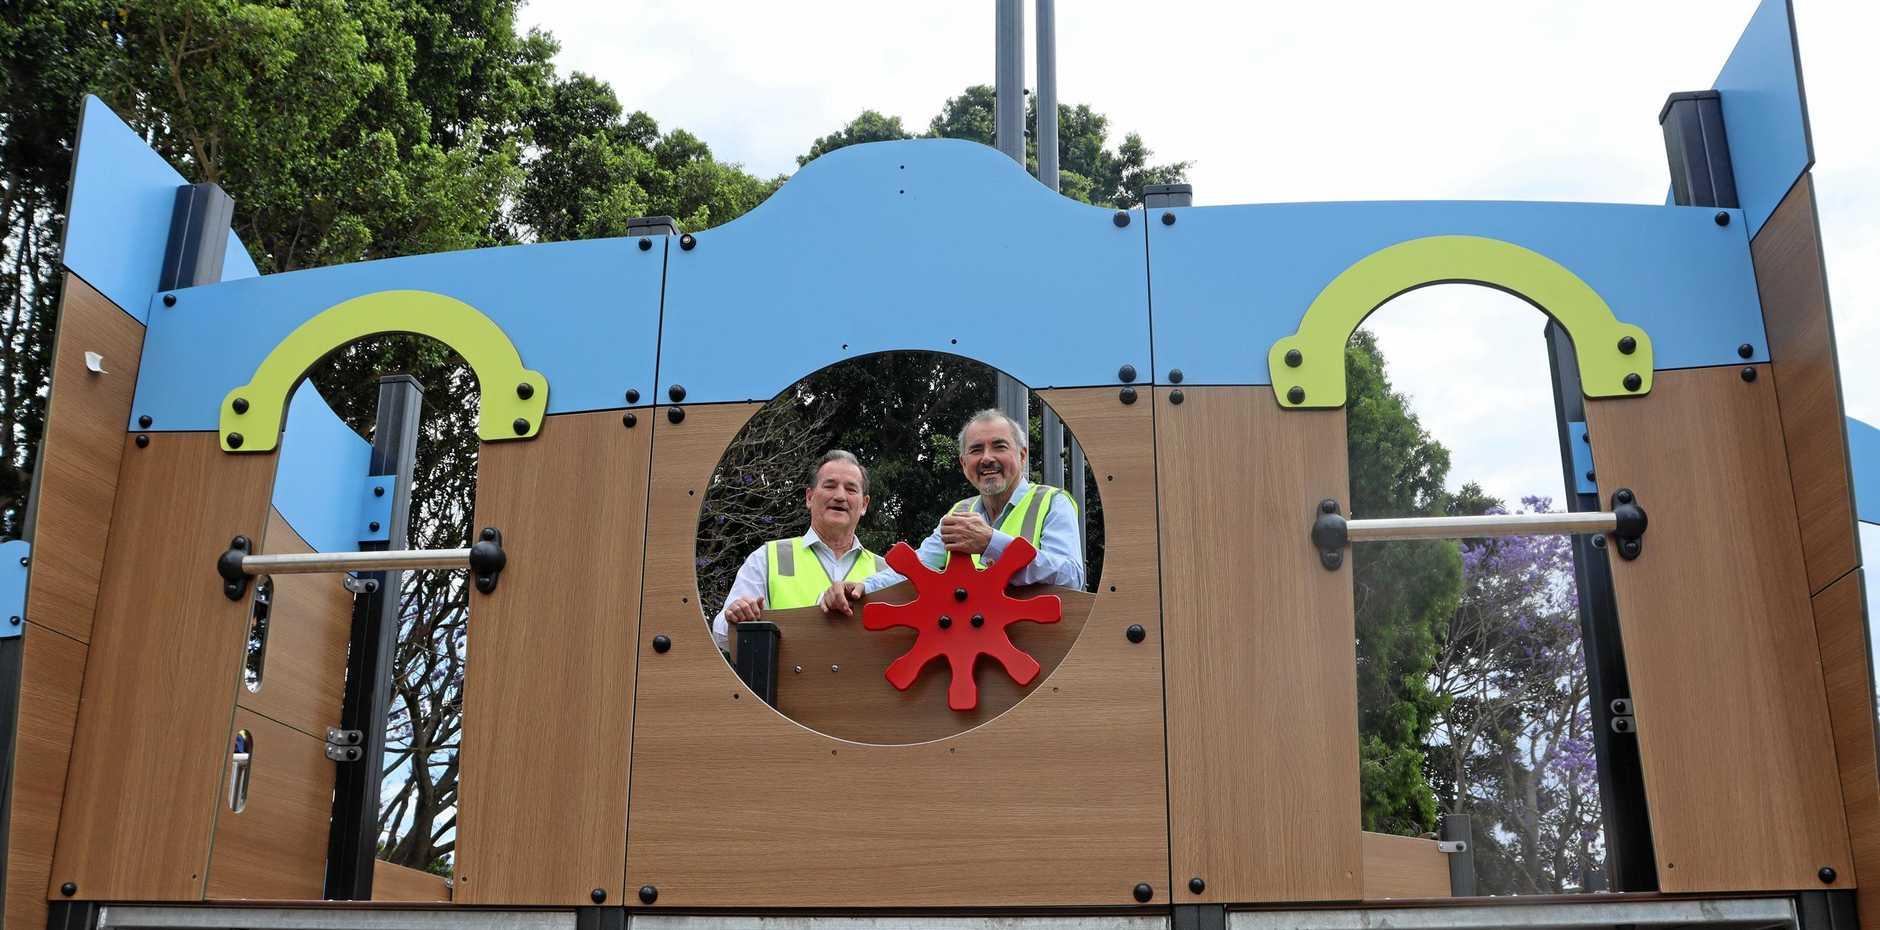 PLAY TIME: Mayor Jim Simmons and Clarence MP Chris Gulaptis enjoy the new play equipment at Jacaranda Park.